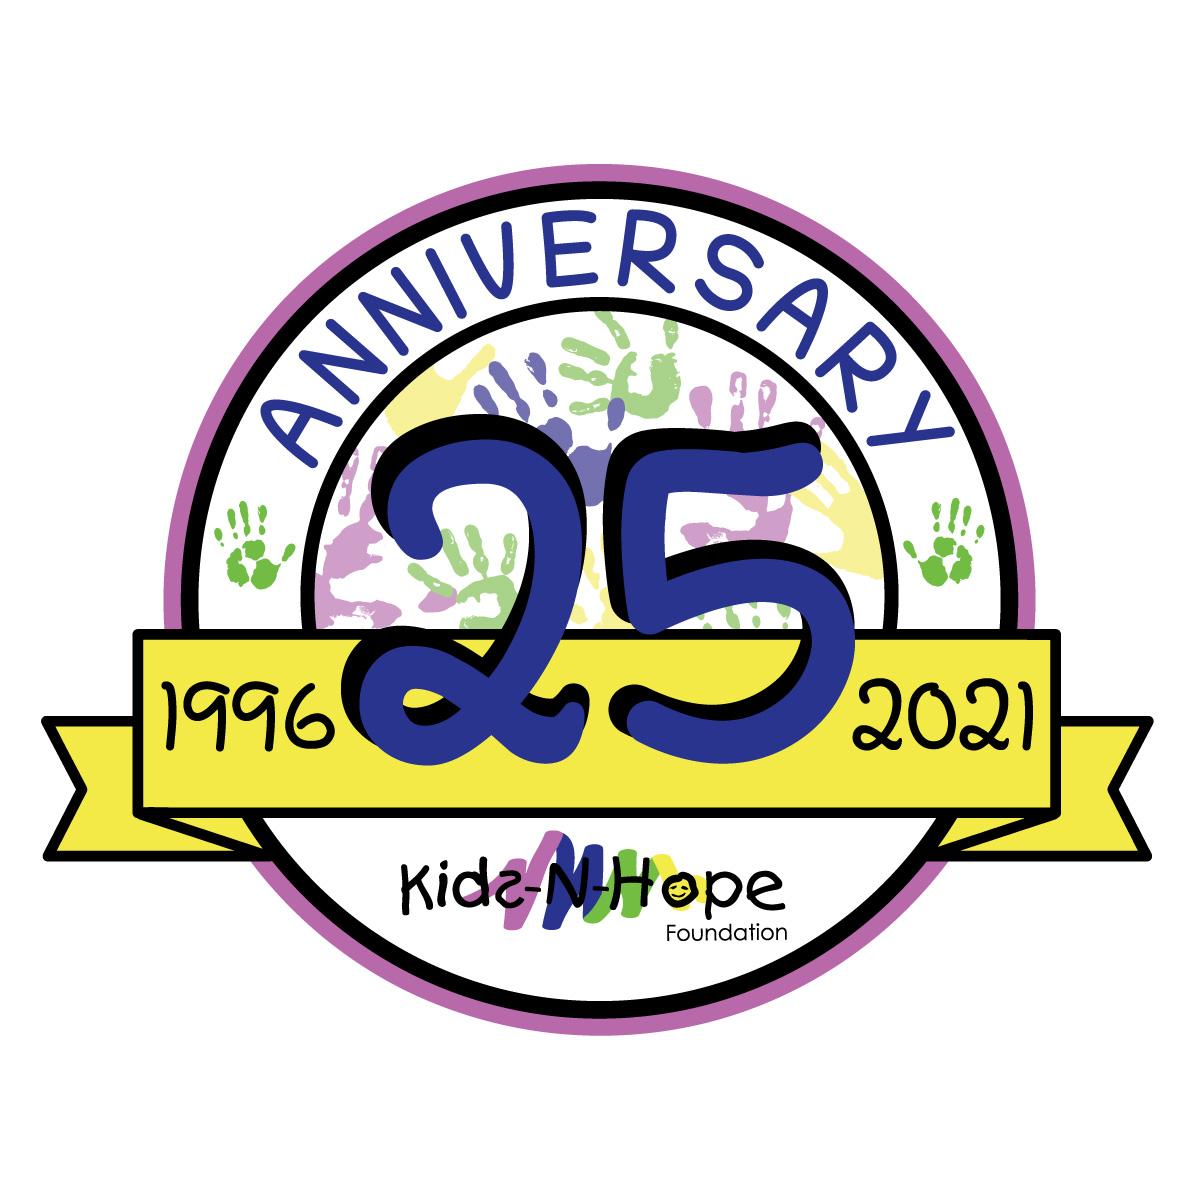 Kids-N-Hope 25th Anniversary Logo